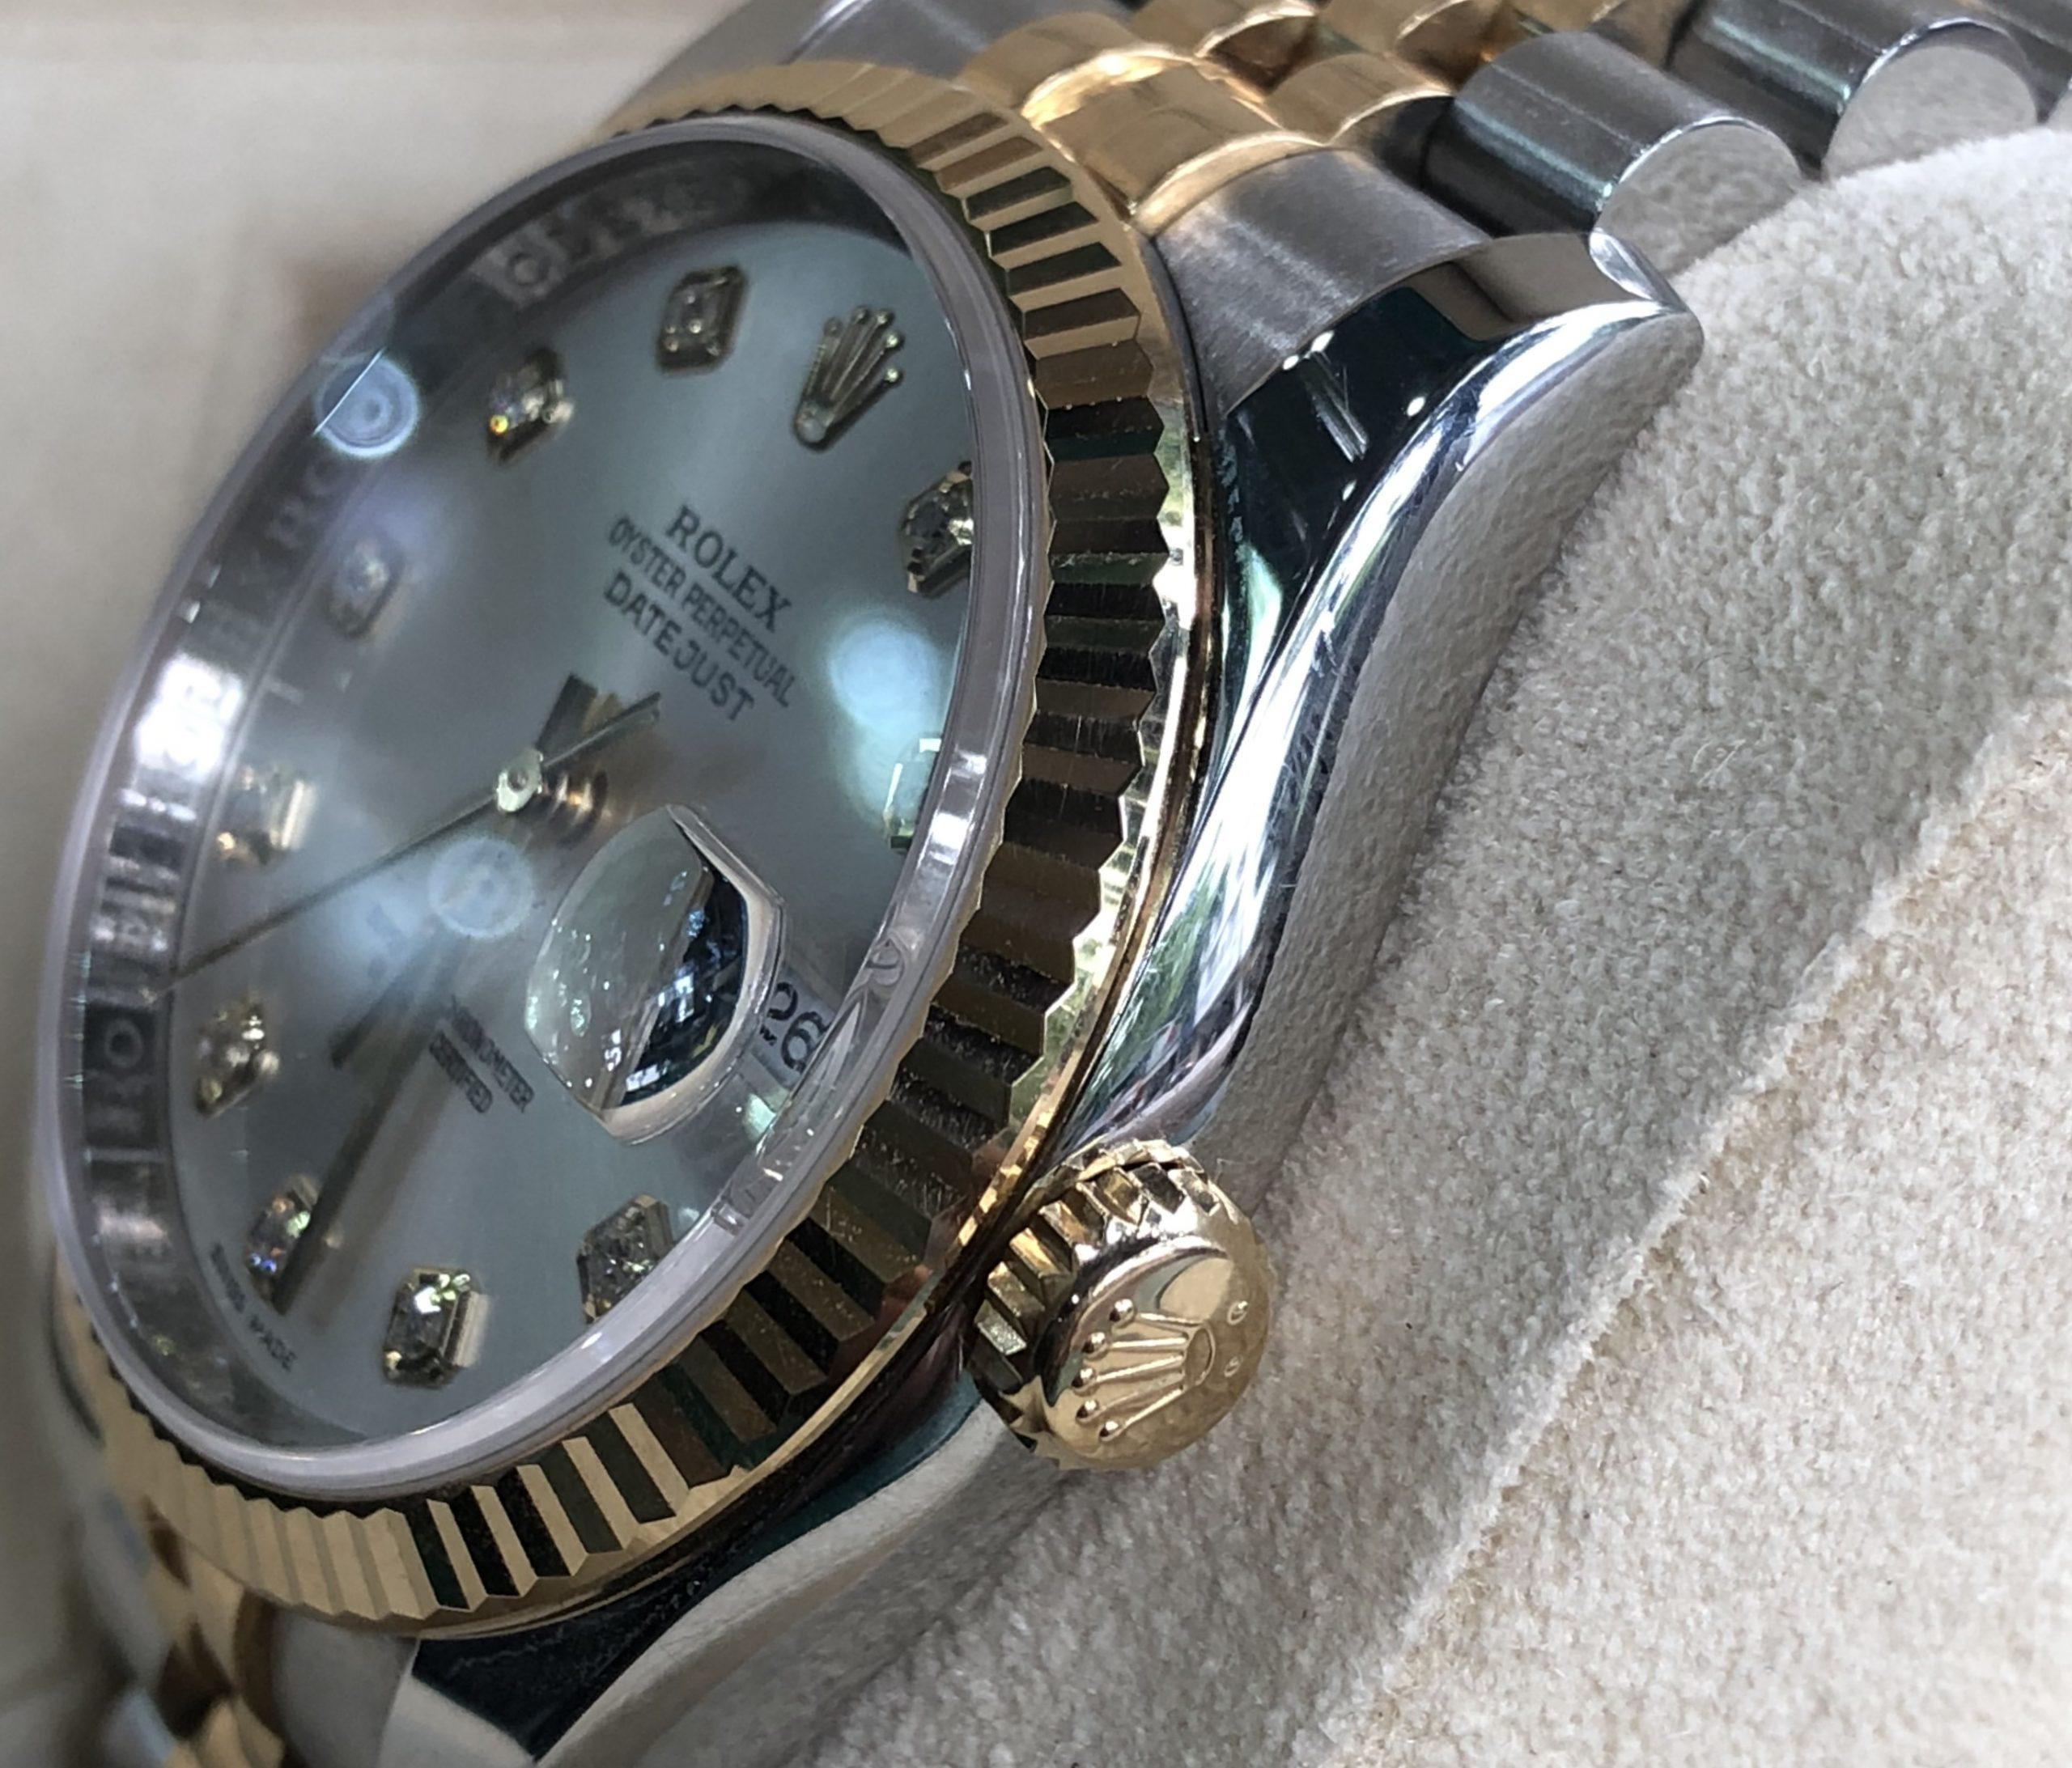 Rolex 116233 mặt trắng tia demi vàng đời 2012